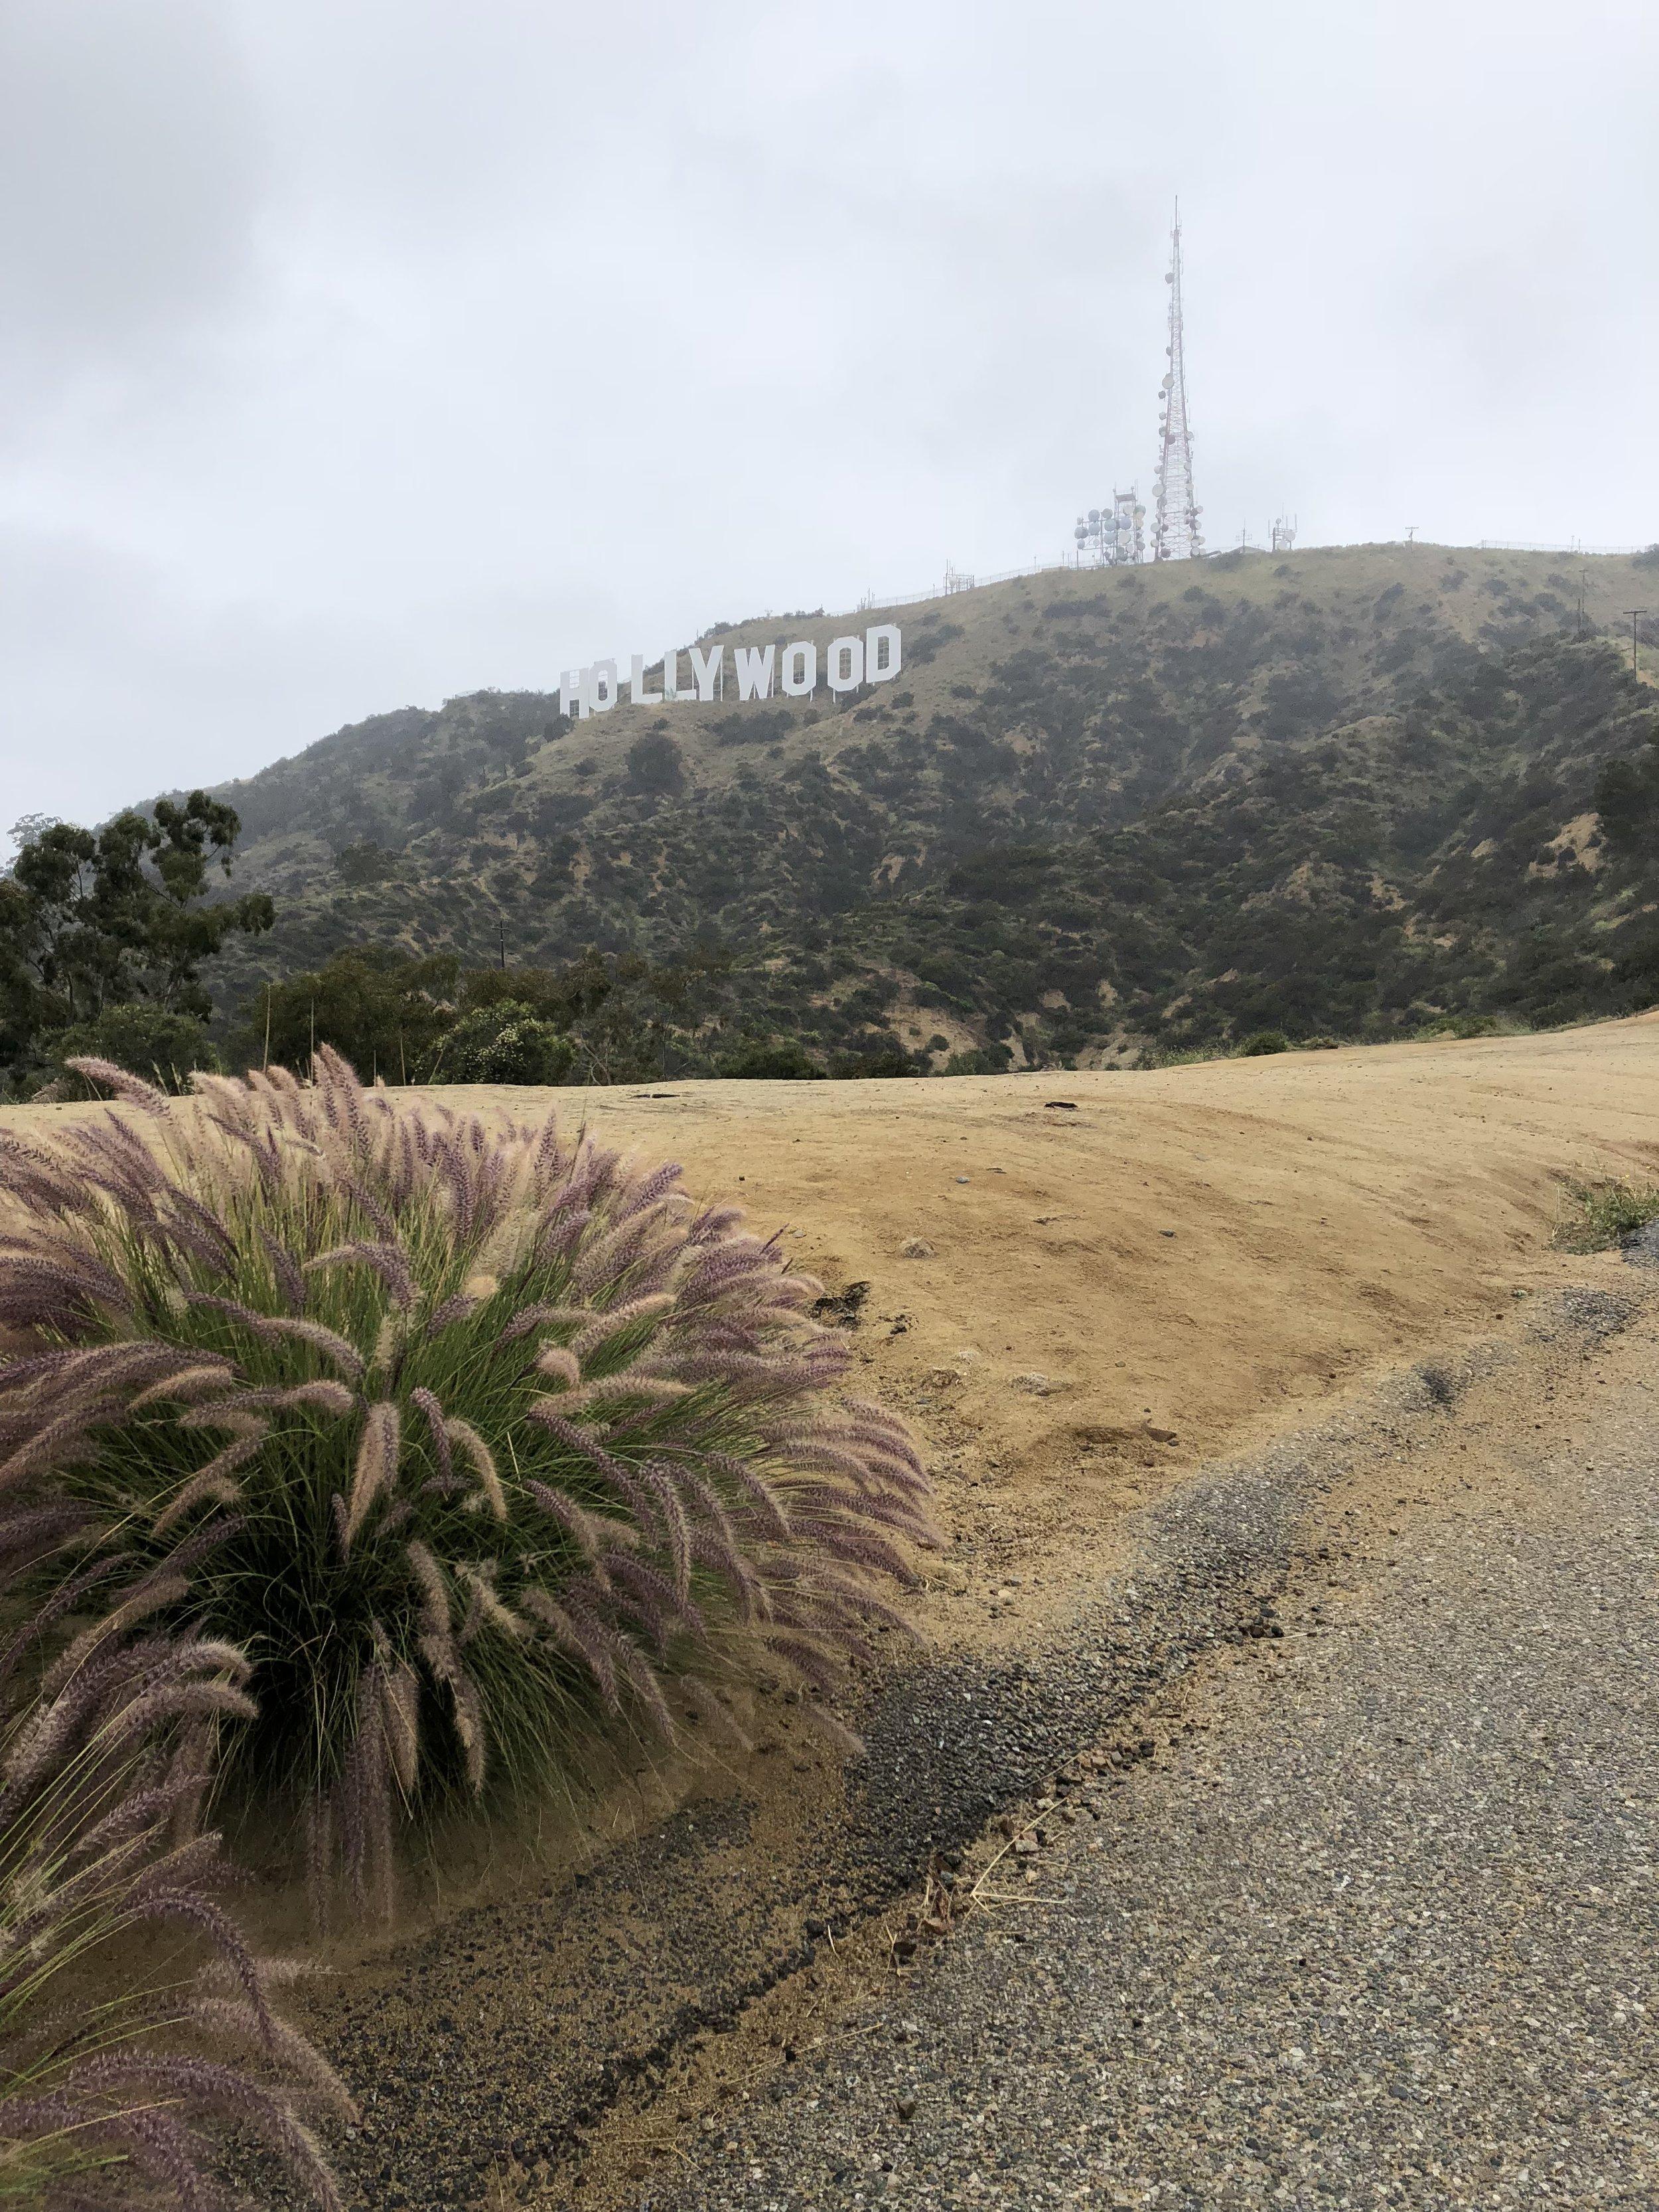 Hollywood Sign short hike